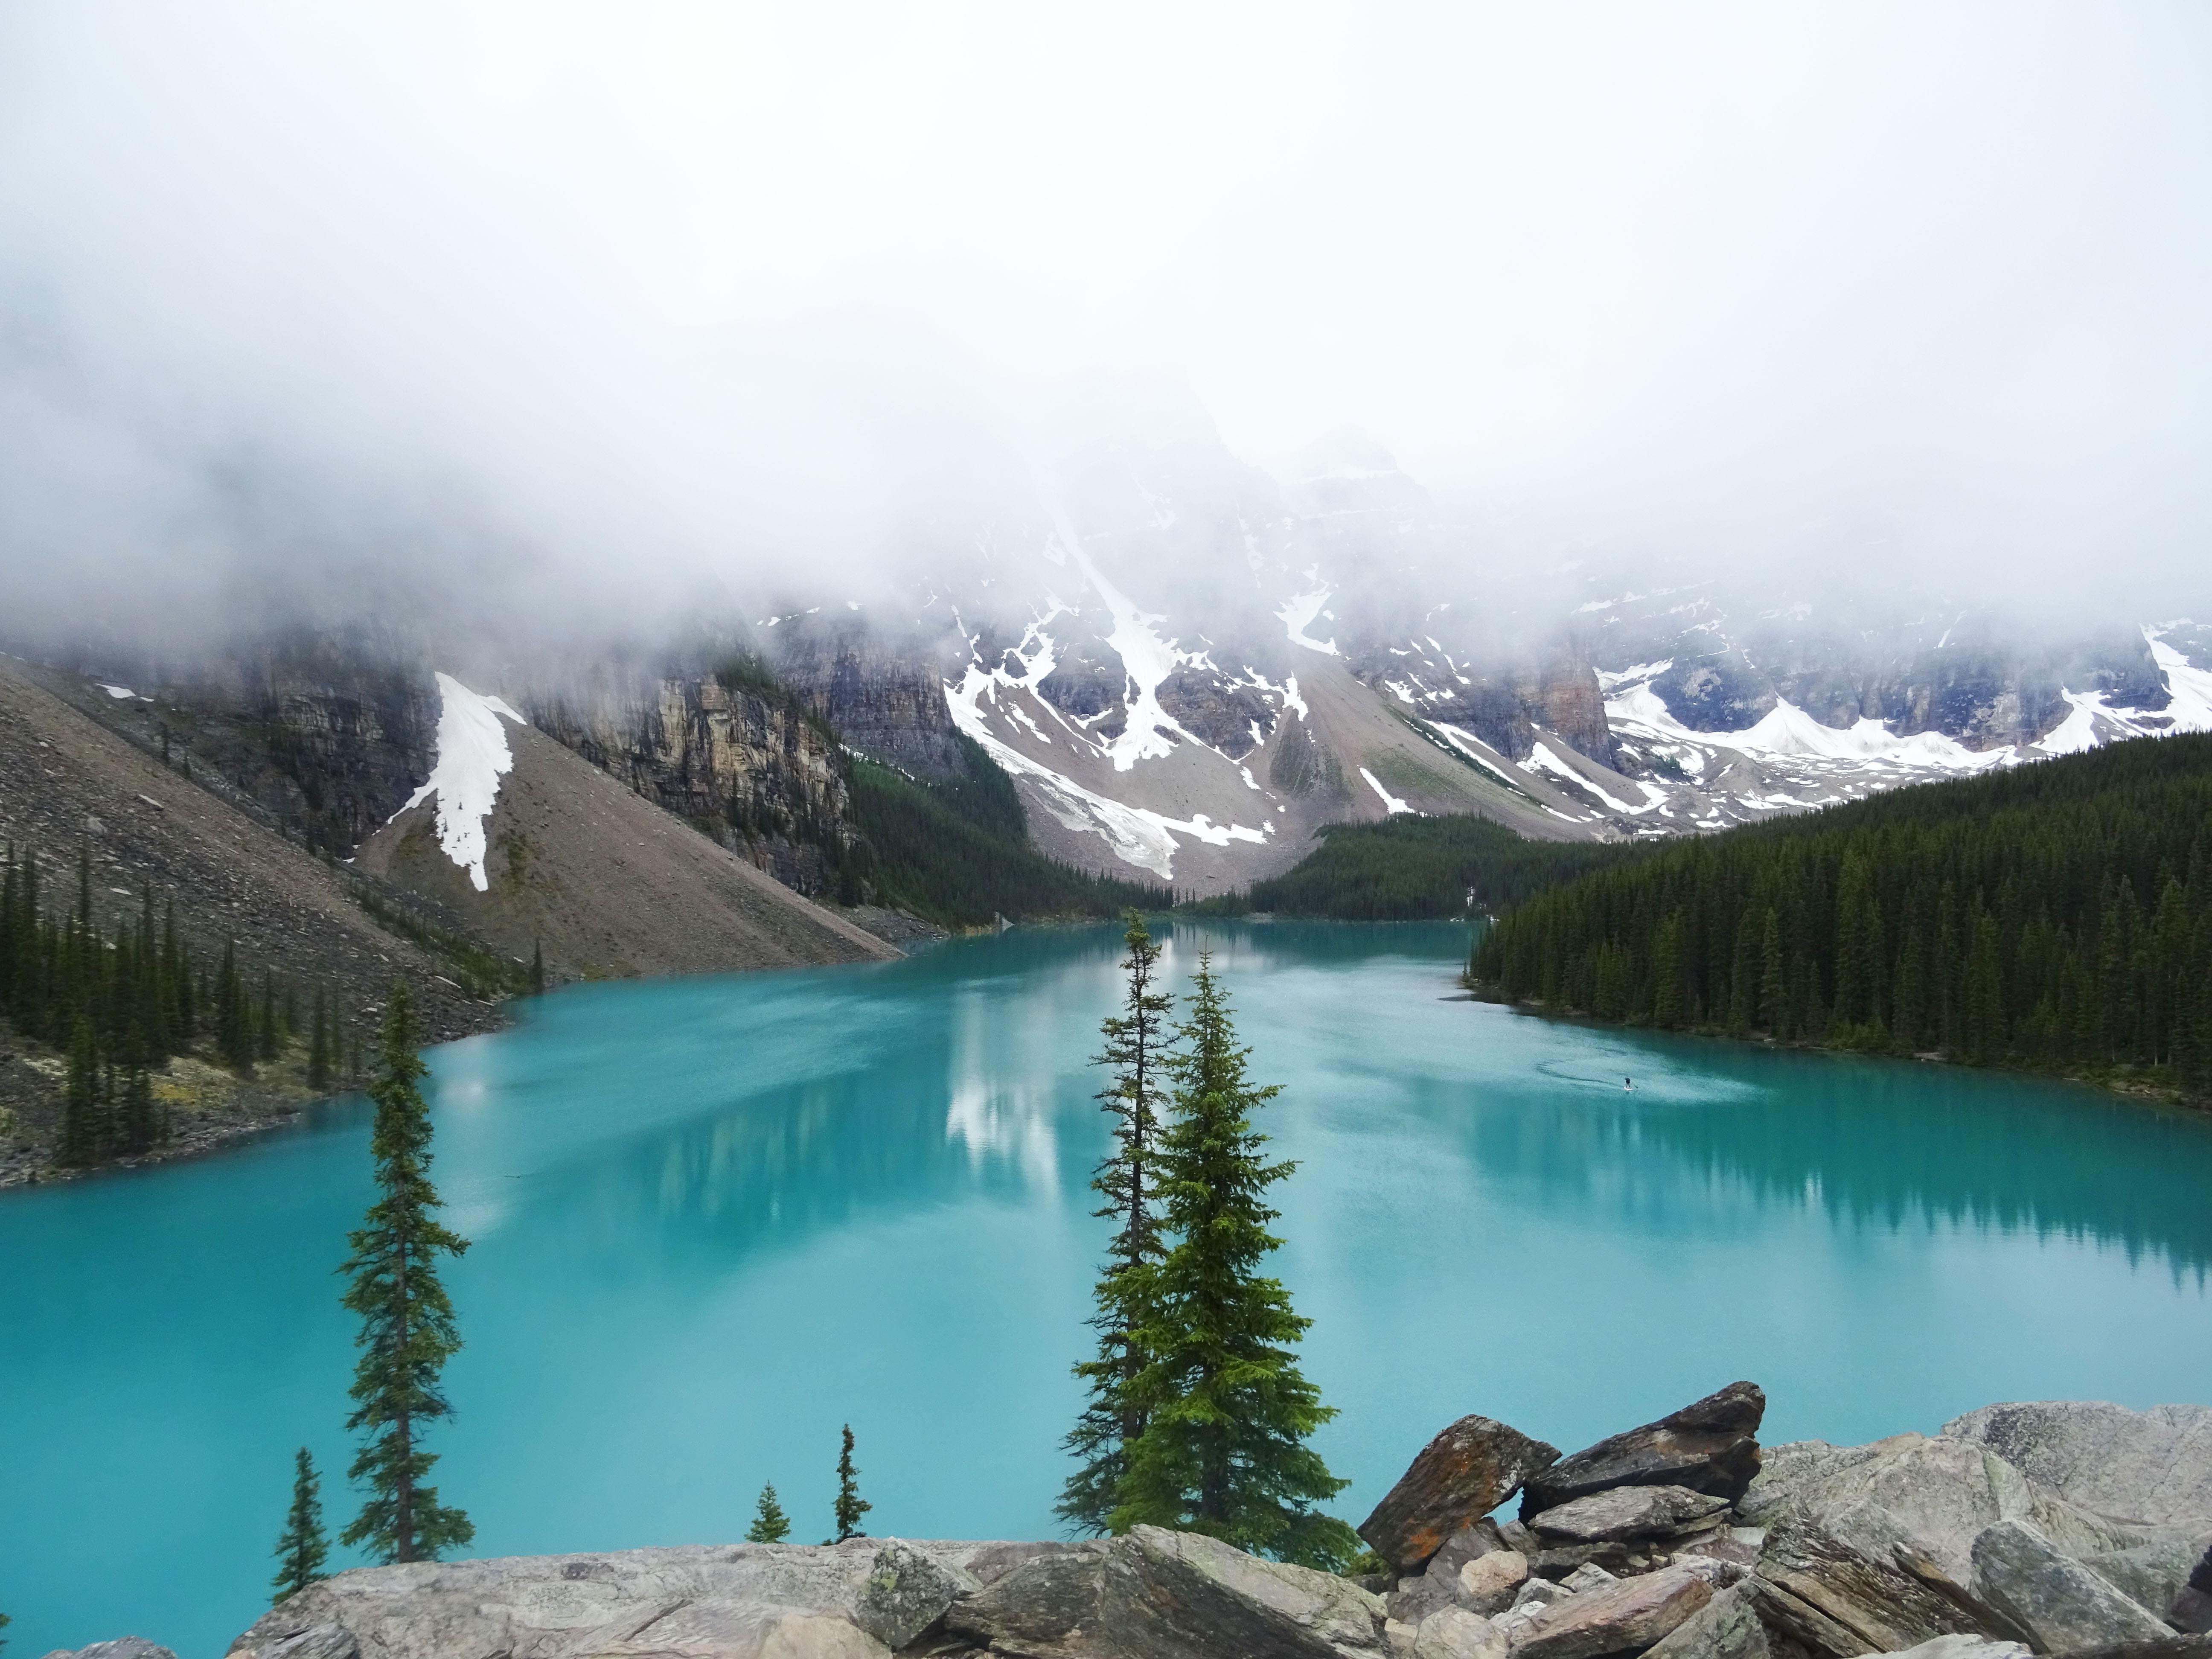 Lac Moraine, Parc national de Banff, Alberta, Canada